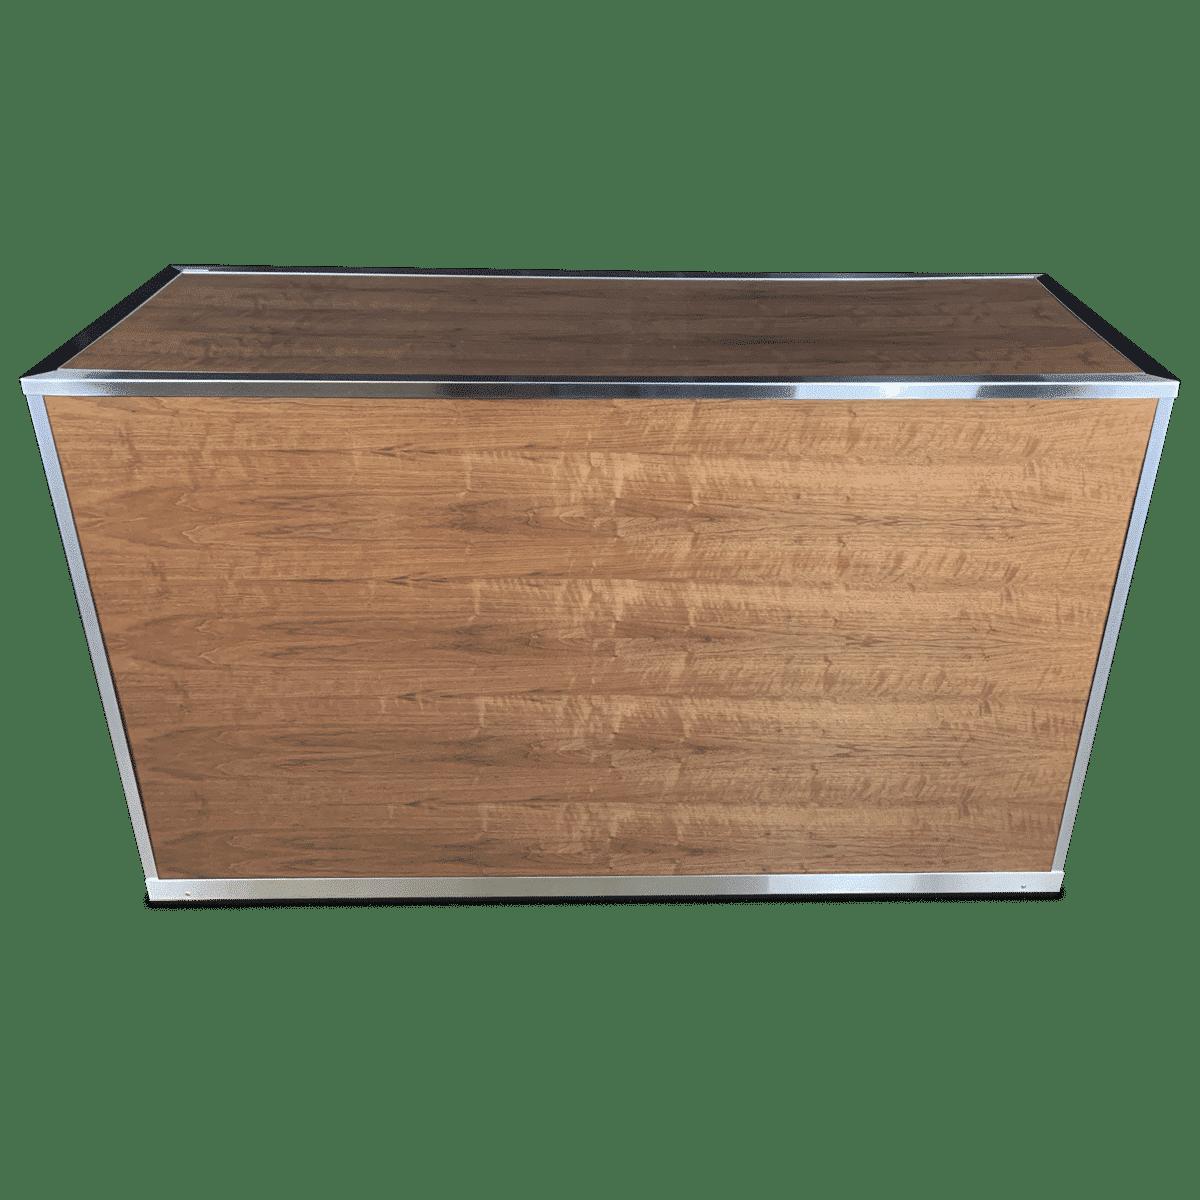 Black Walnut Wood Cover Panels for VERSATI Portable Bar